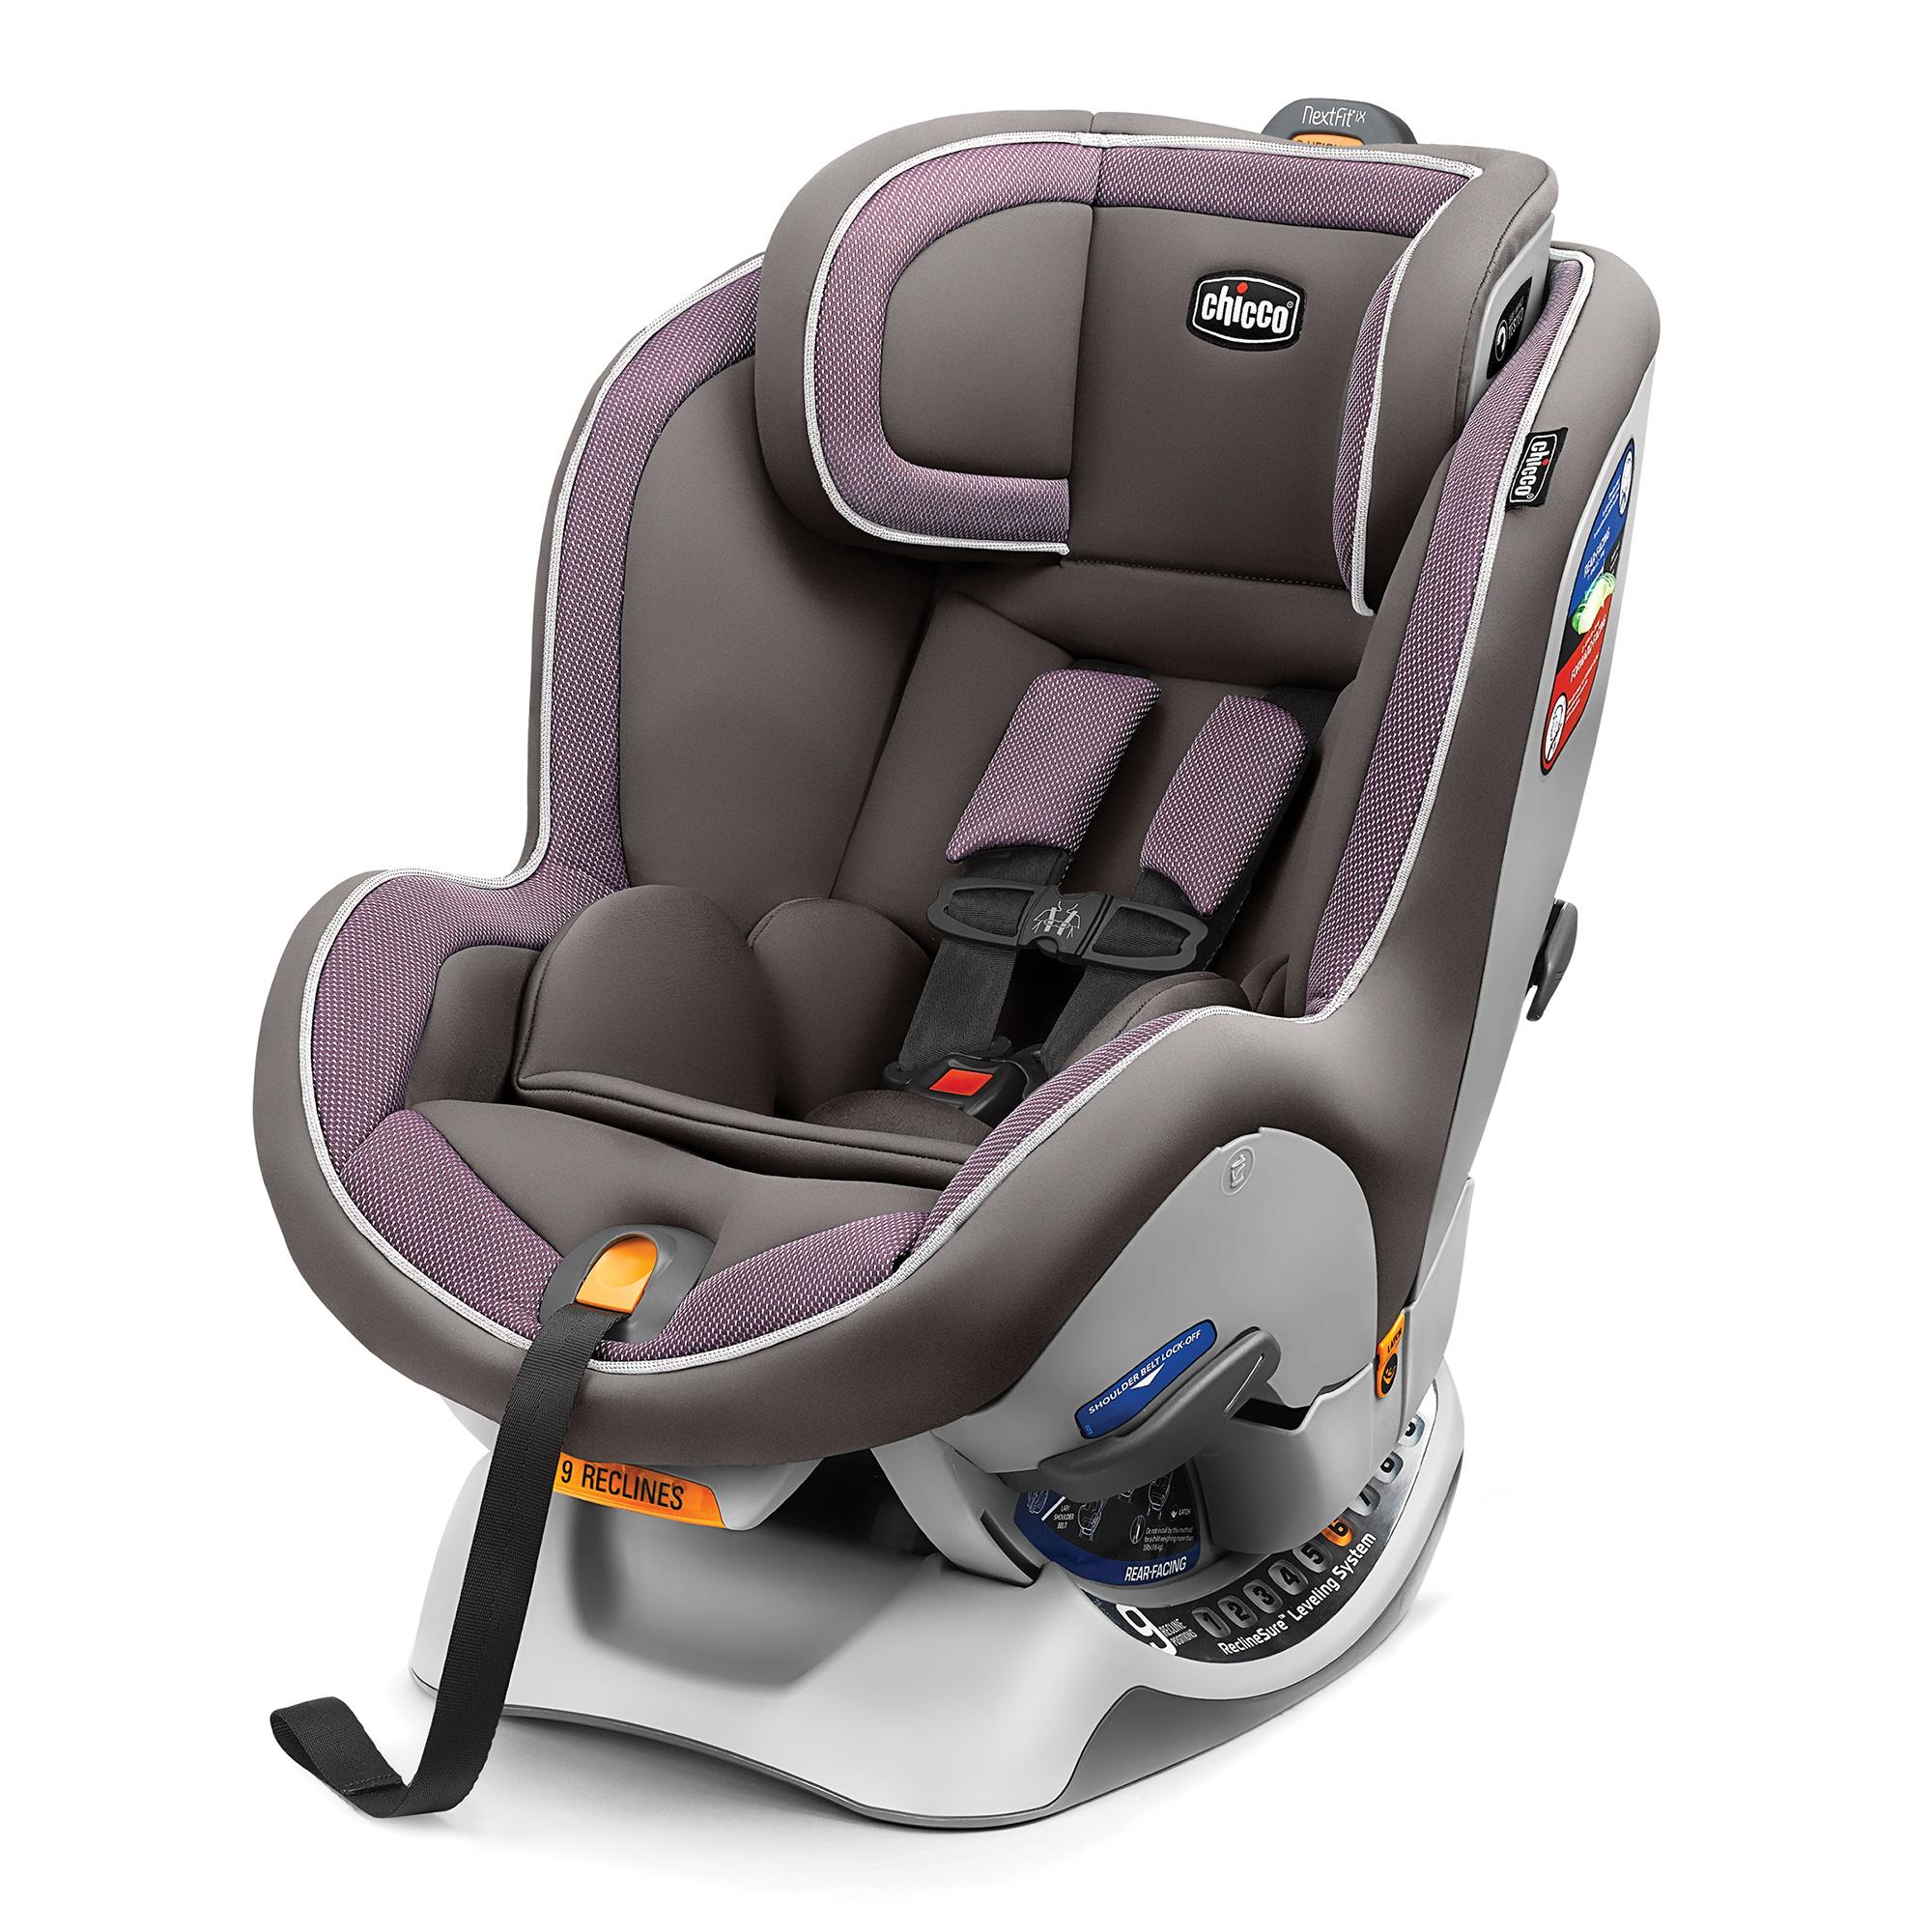 Chicco Nextfit Ix Convertible Car Seat Charm Walmart Com